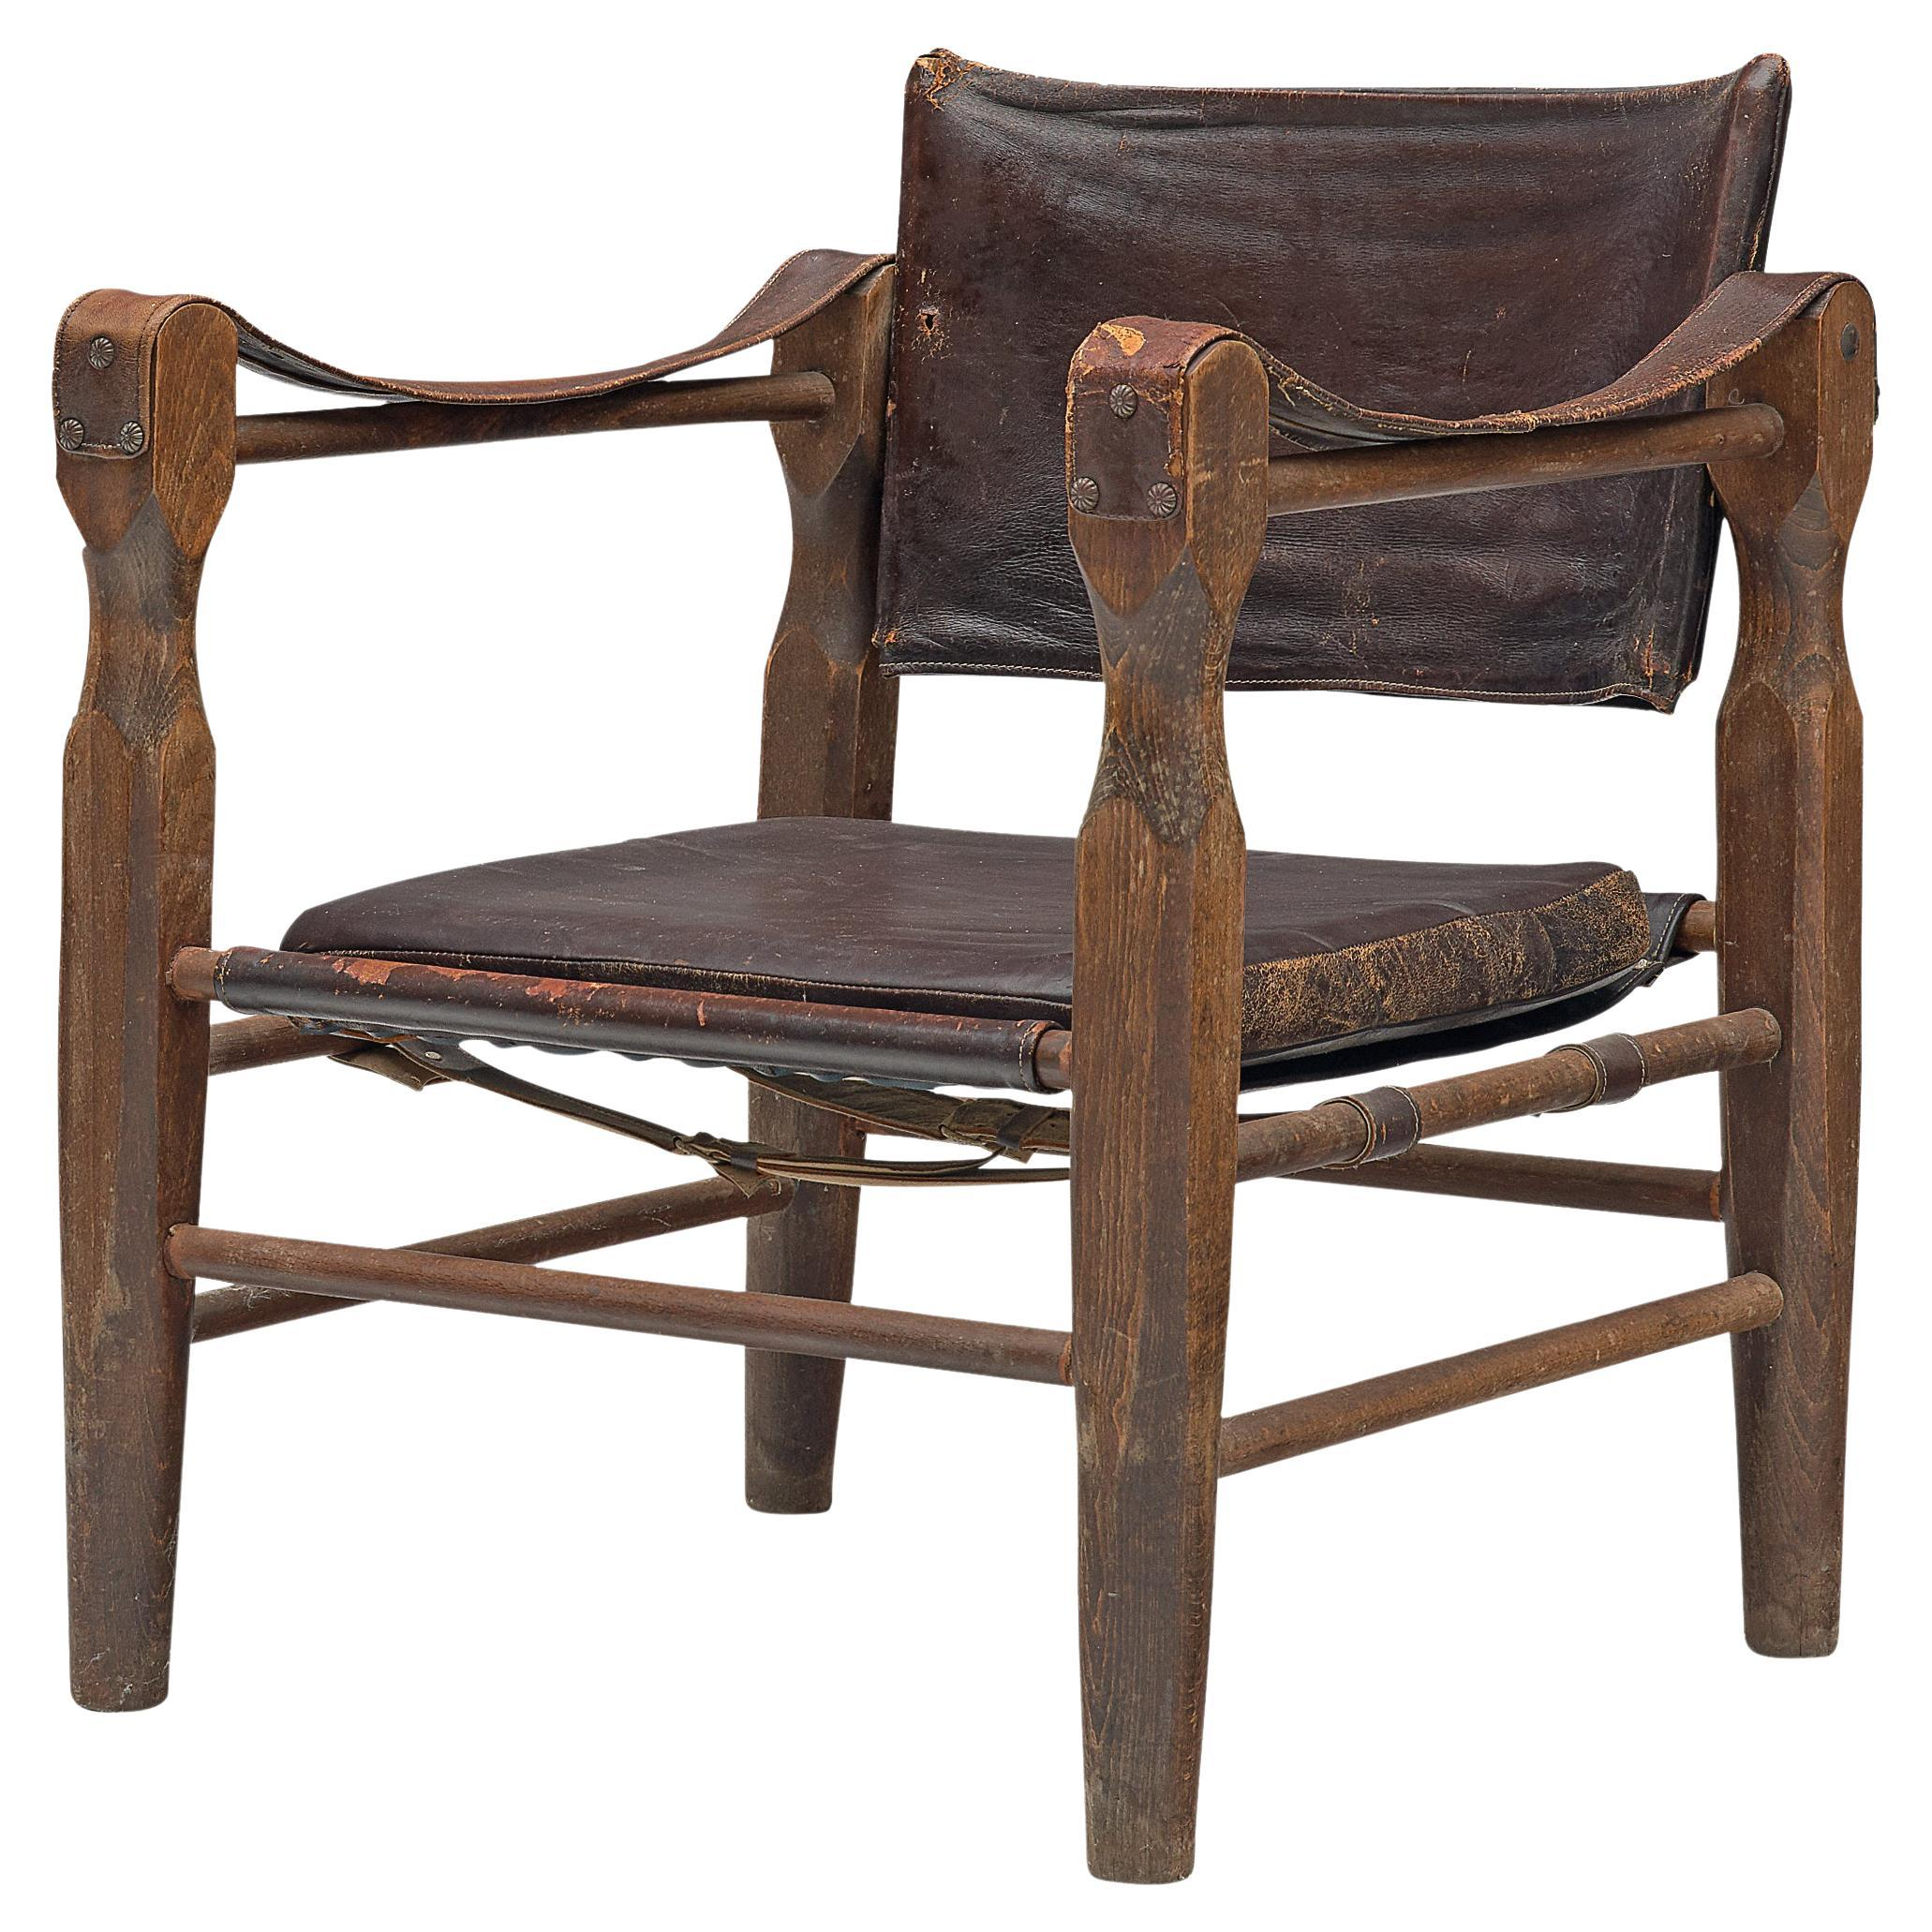 Safari Chair with Sculptural Wooden Frames